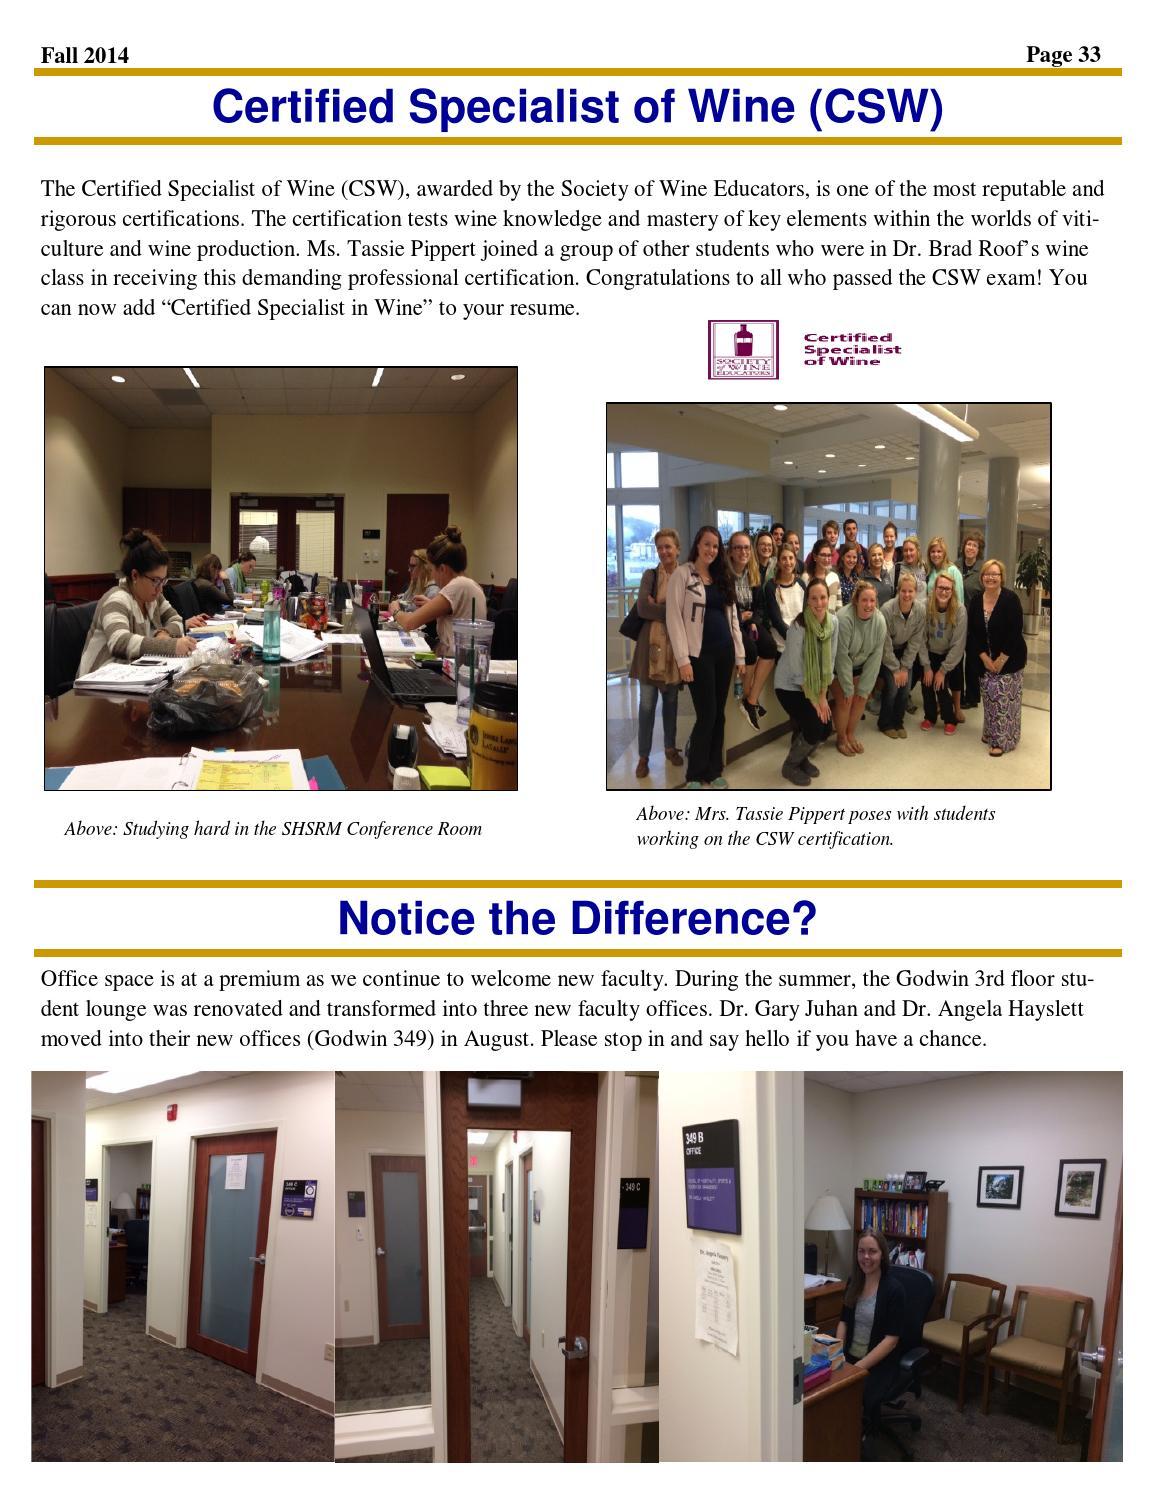 Newsletter Fall 2014 12 11 14 Final By Jmu Shsrm Issuu